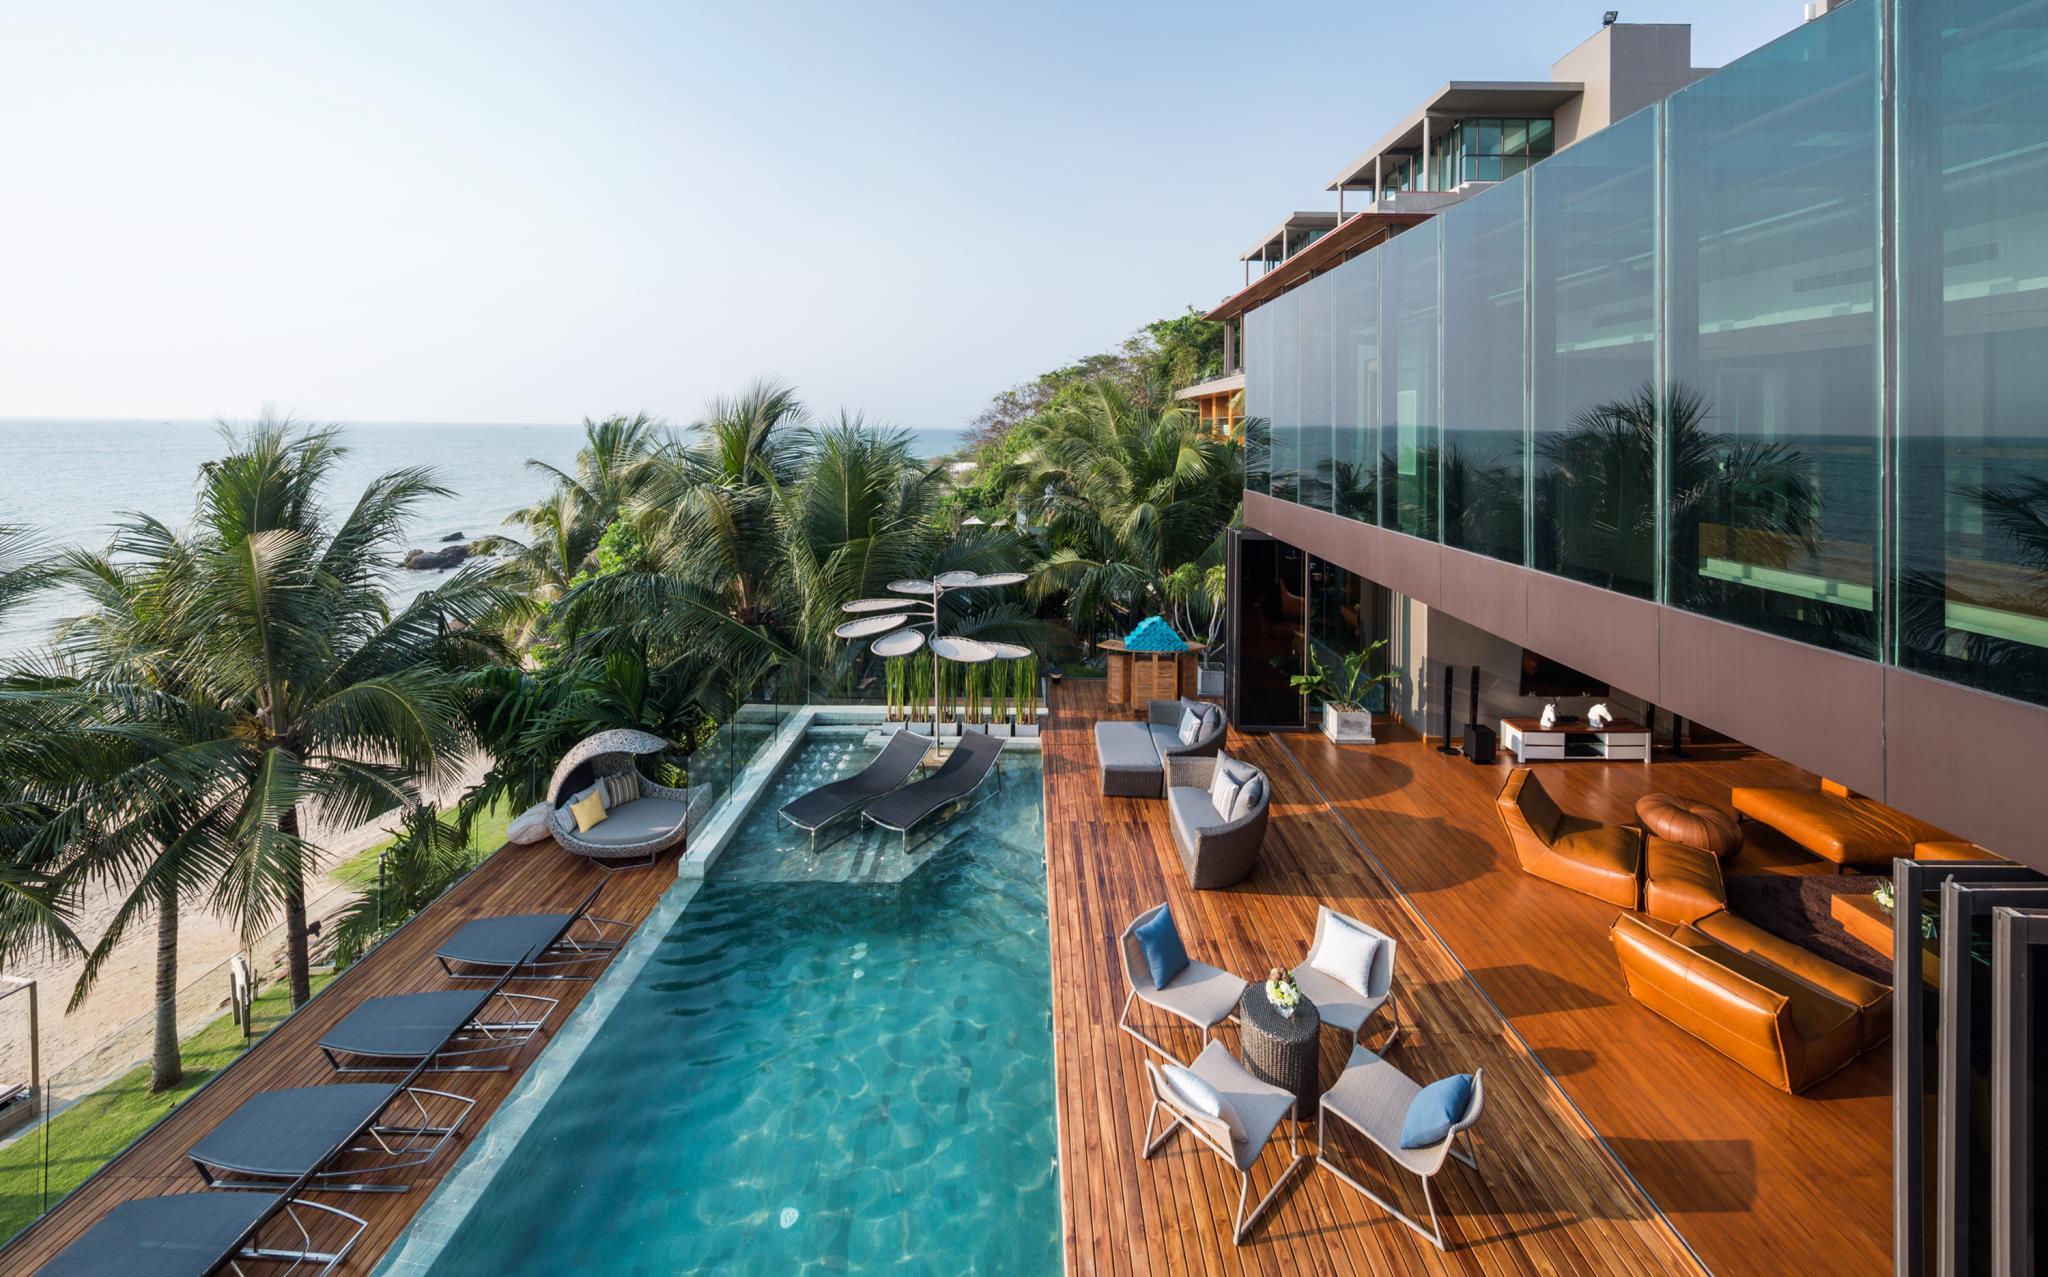 Best Resort/Hotel in Pattaya-Cape Dara Resort